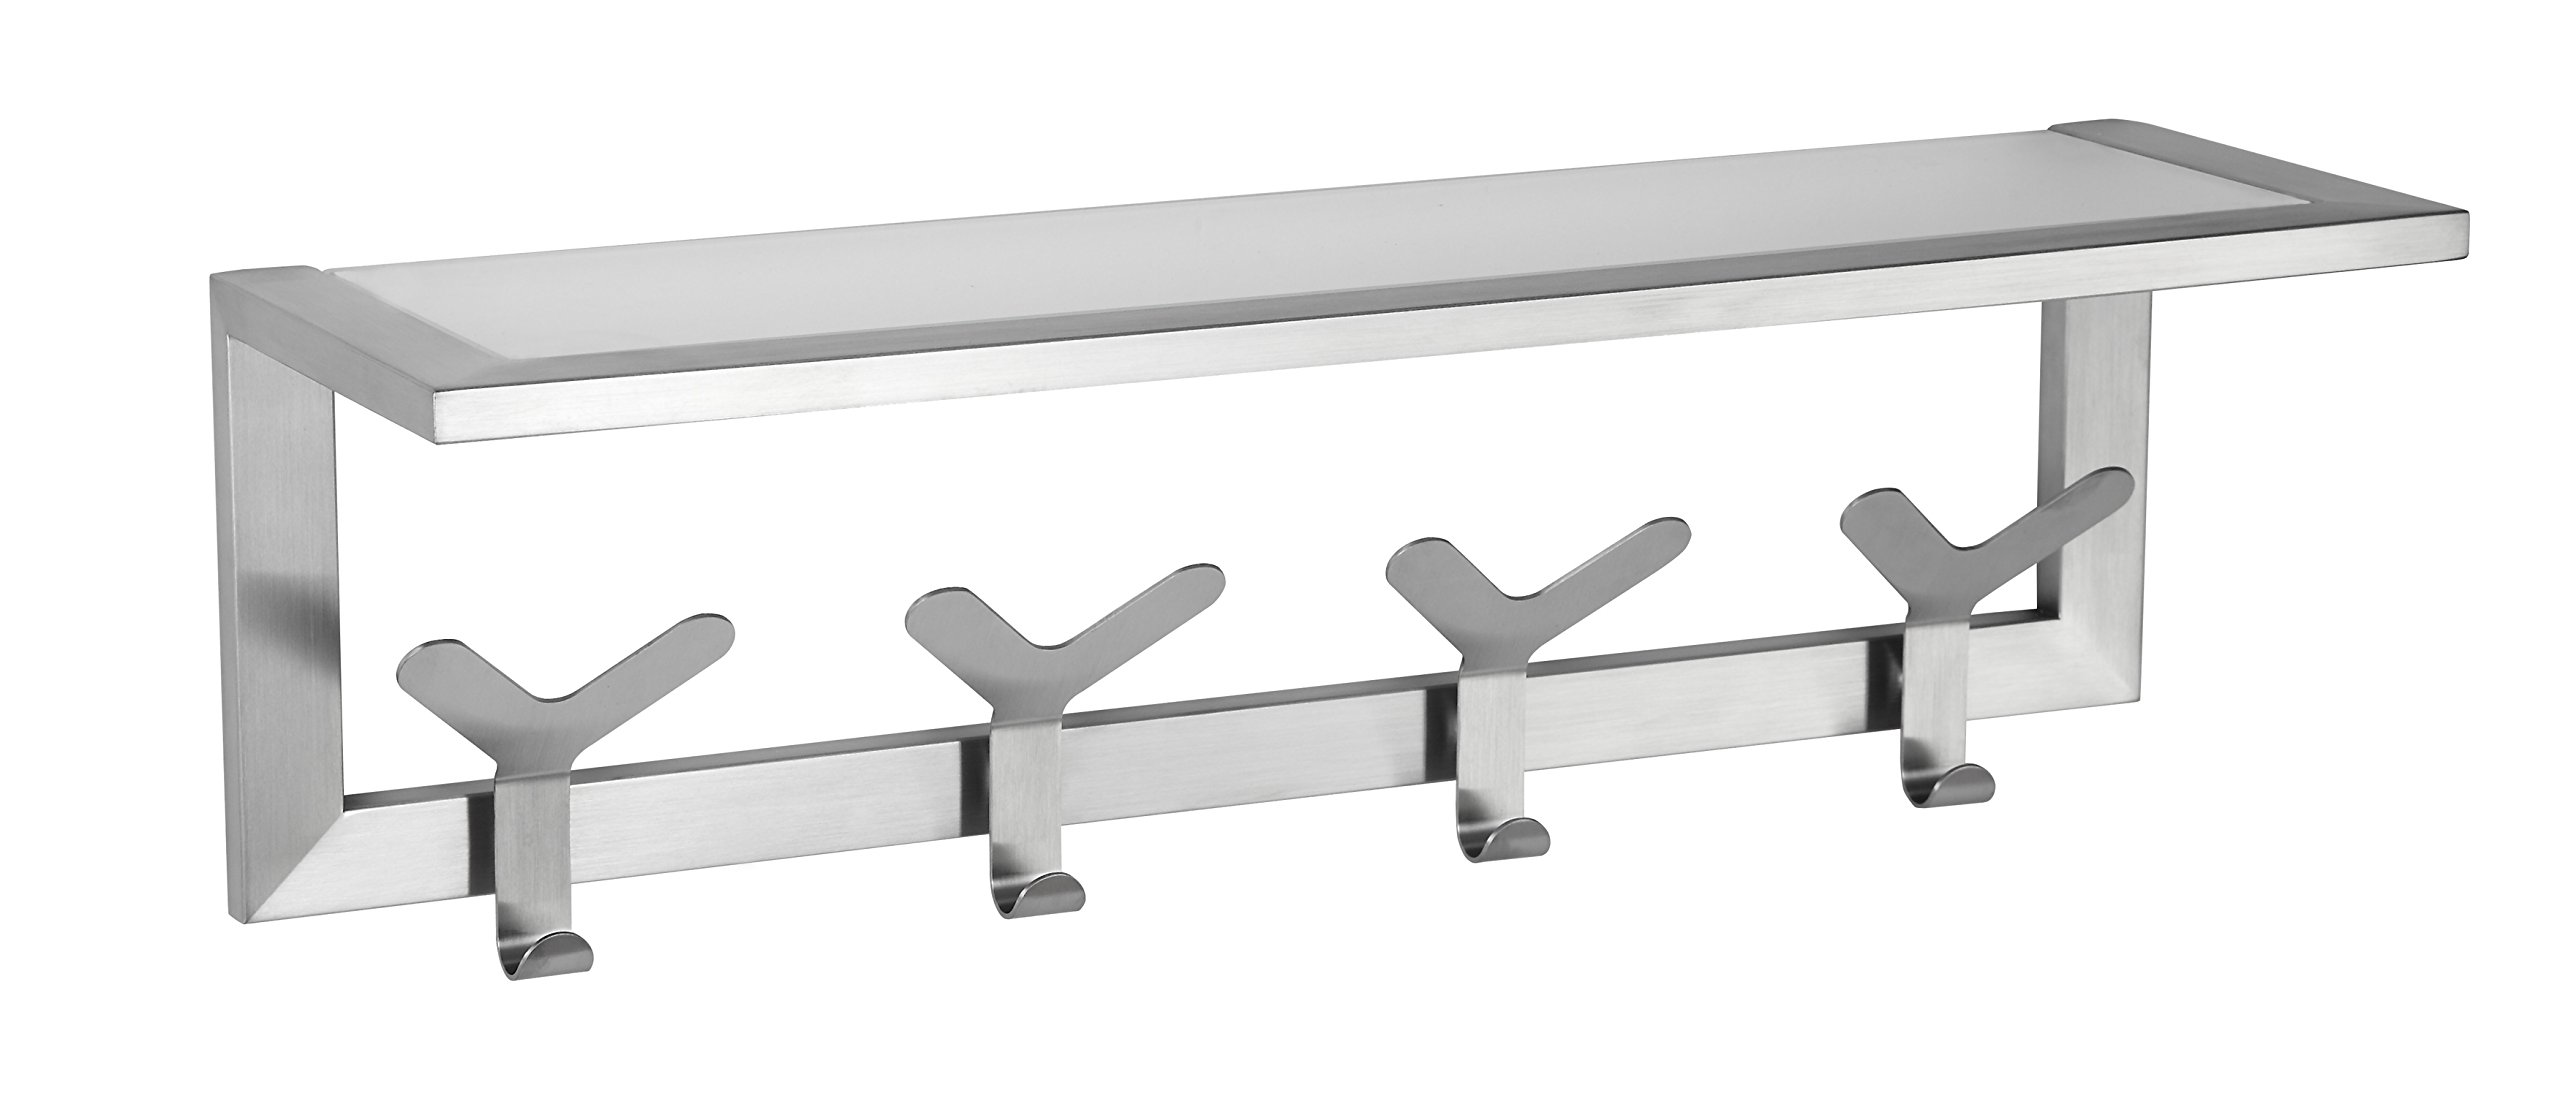 Cortesi Home Milton Contemporary Stainless Steel Multipurpose Hook Rail/Rack with Glass Shelf, Brushed Aluminum